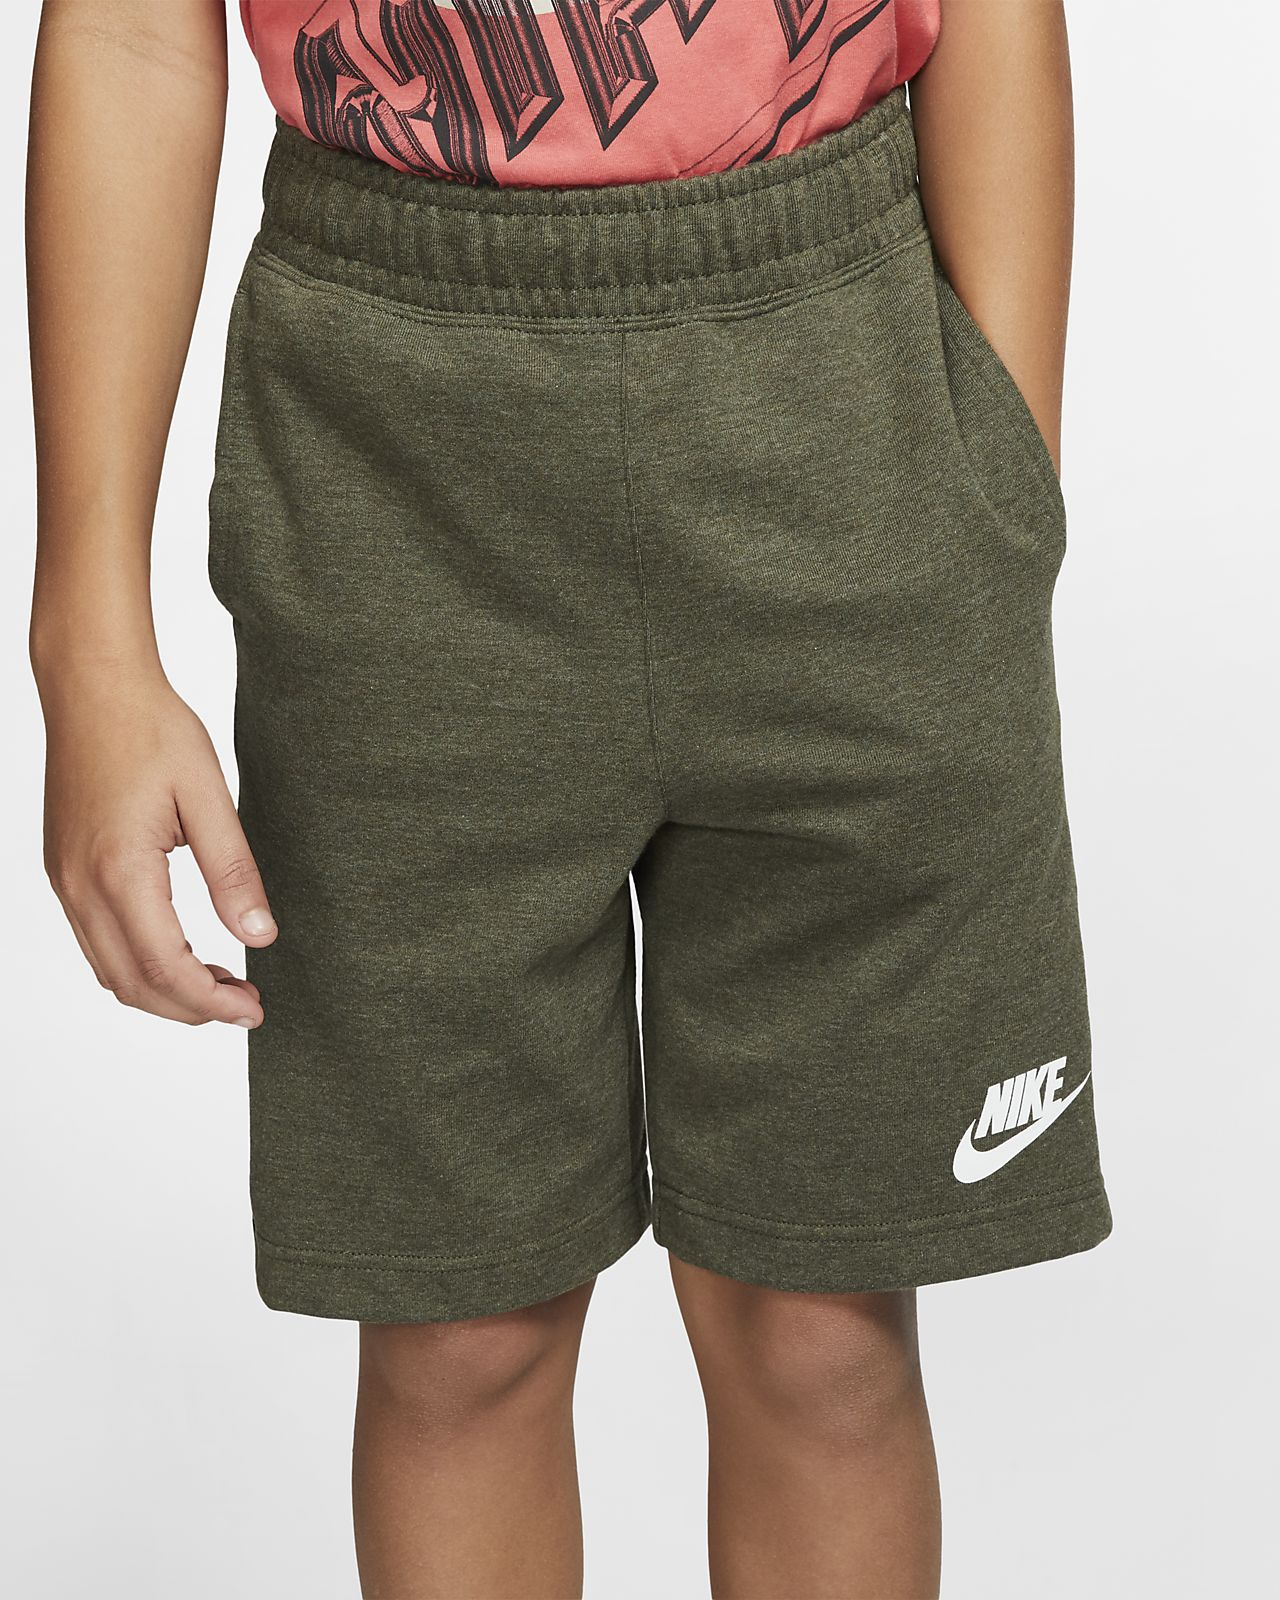 Shorts Nike Sportswear för killar